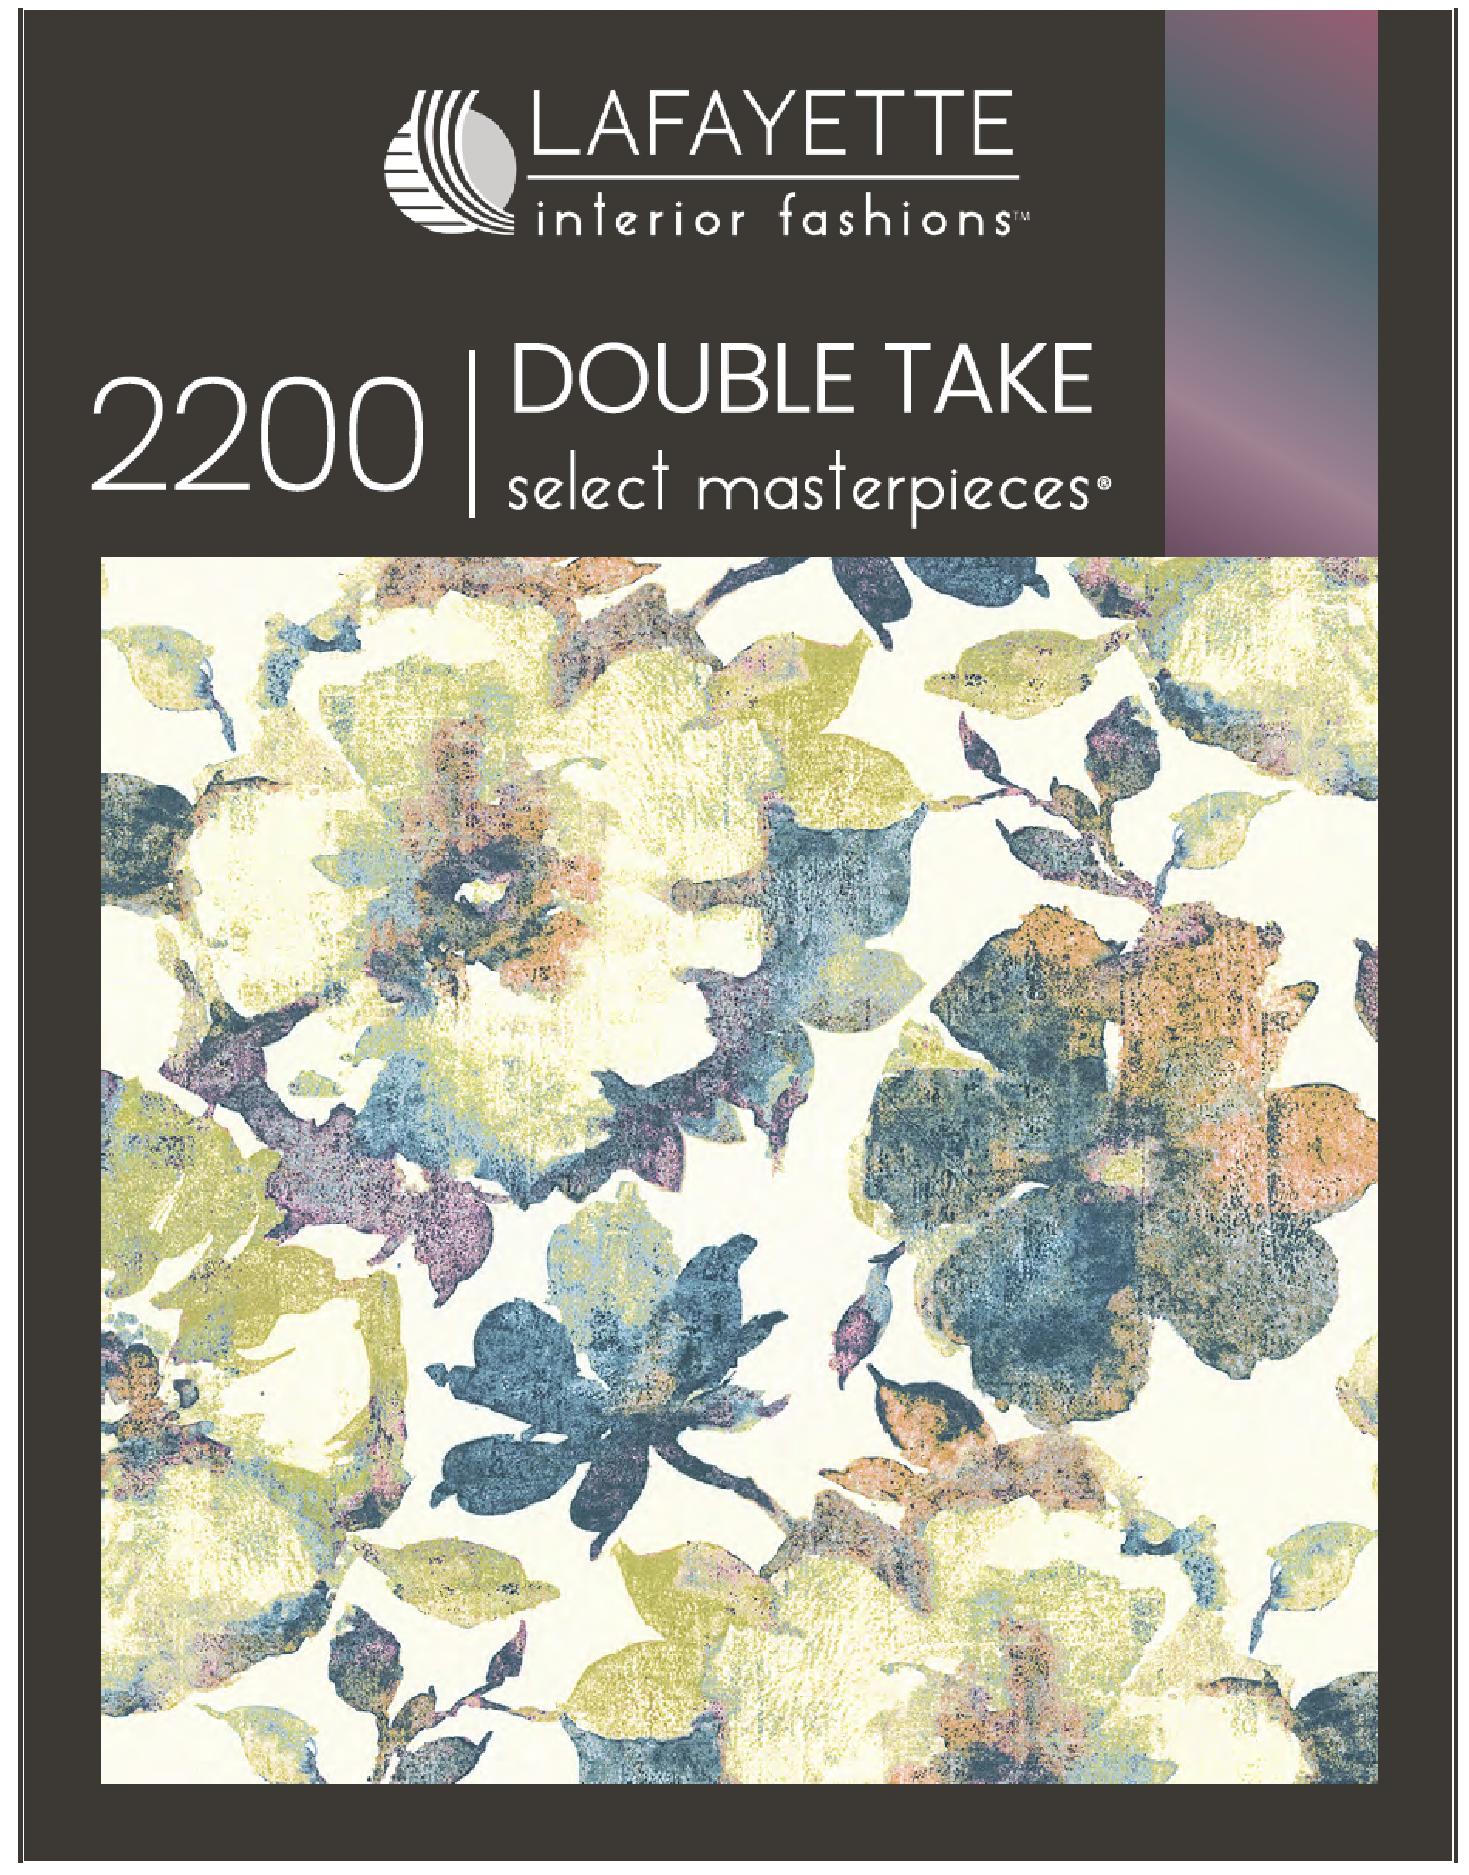 Double Take 2200